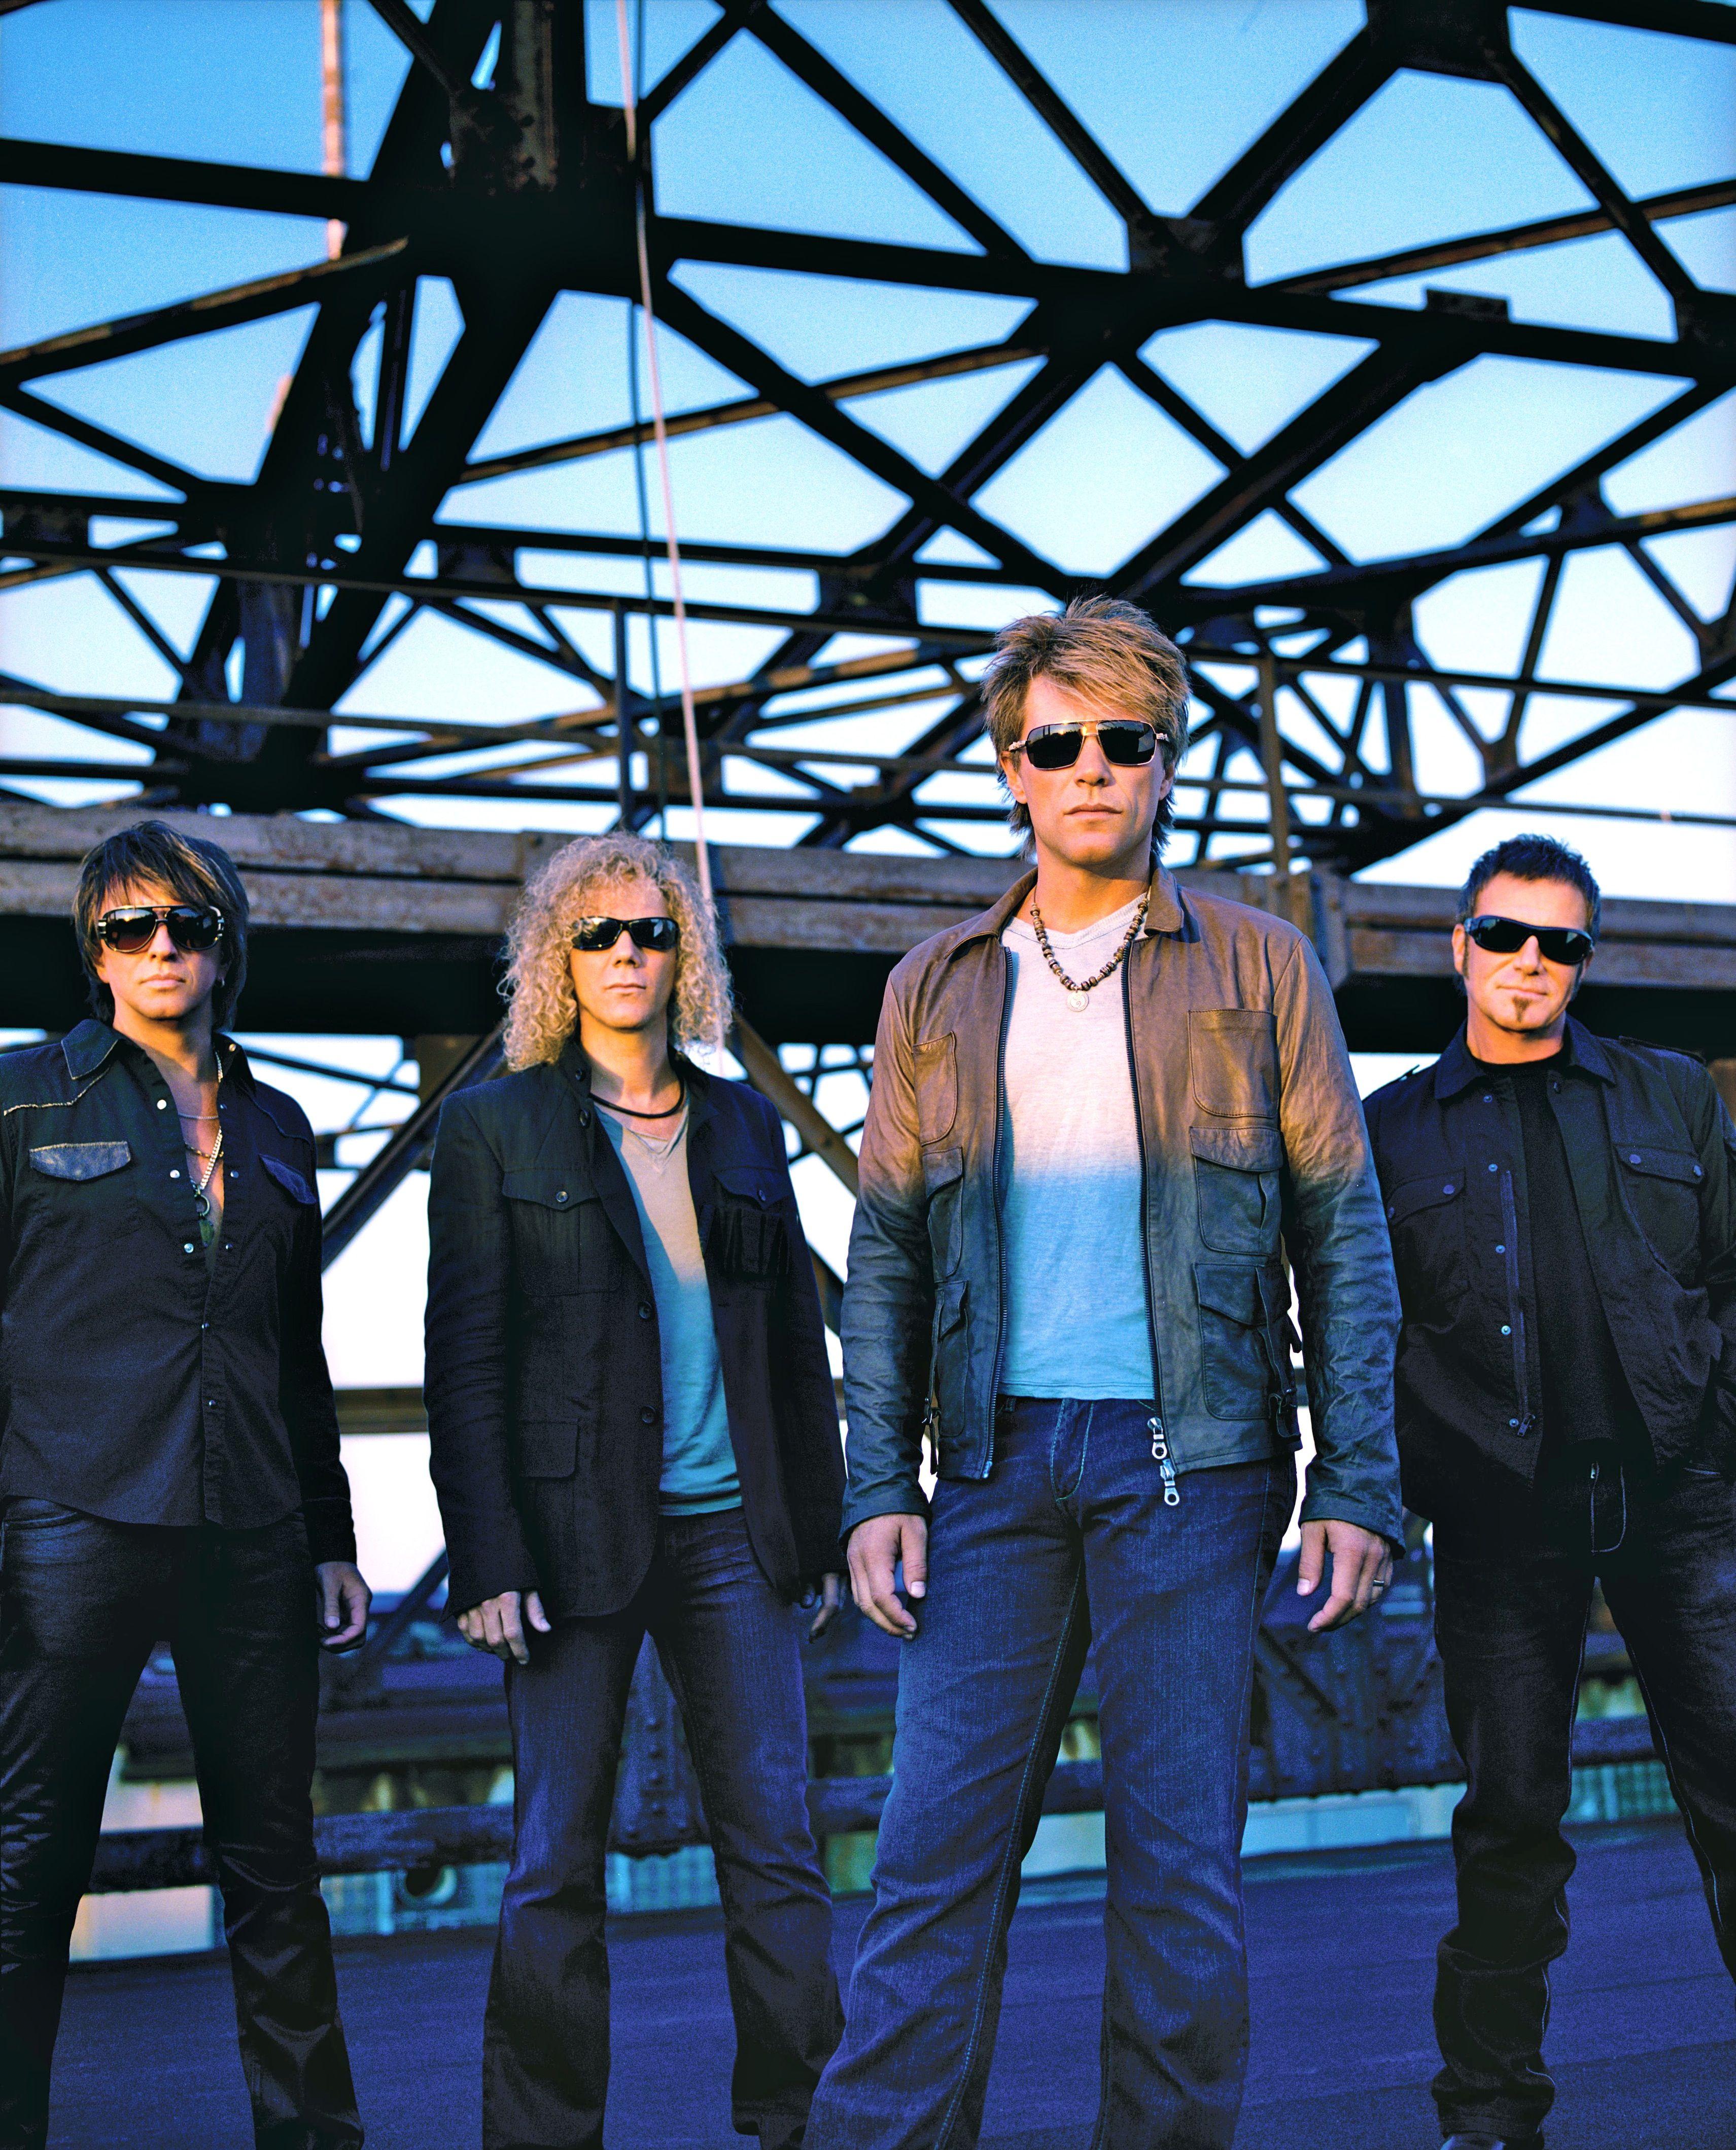 Bon Jovi | Music Artists | Pinterest | Bon jovi and Jon bon jovi